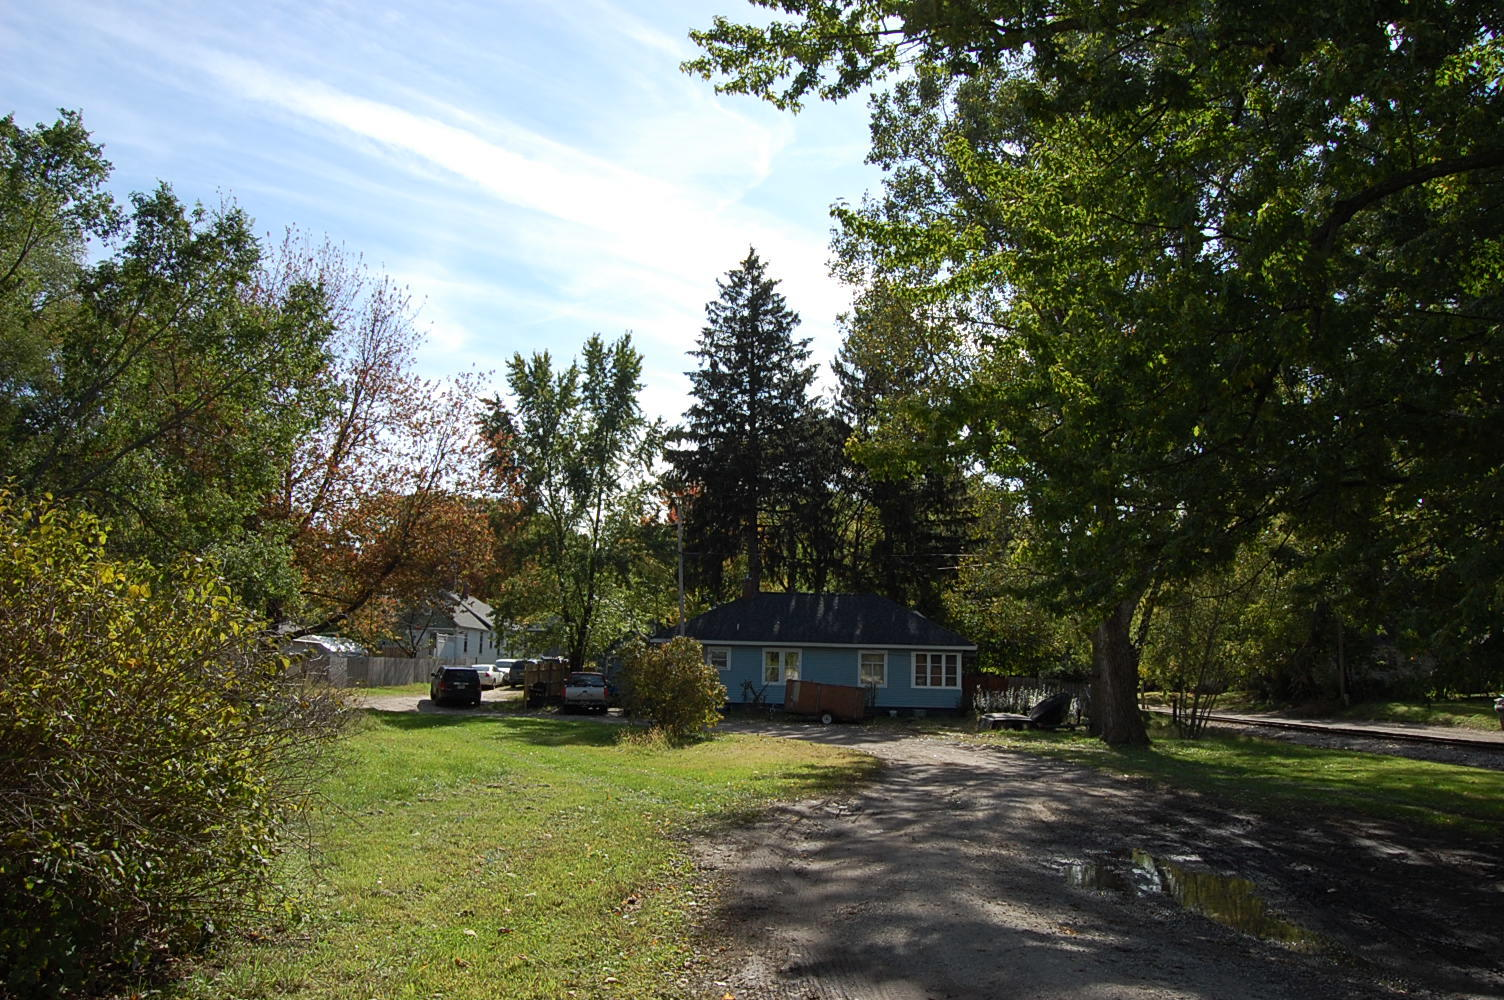 Large Lot in Nice Neighborhood Near Lake Michigan - Image 5